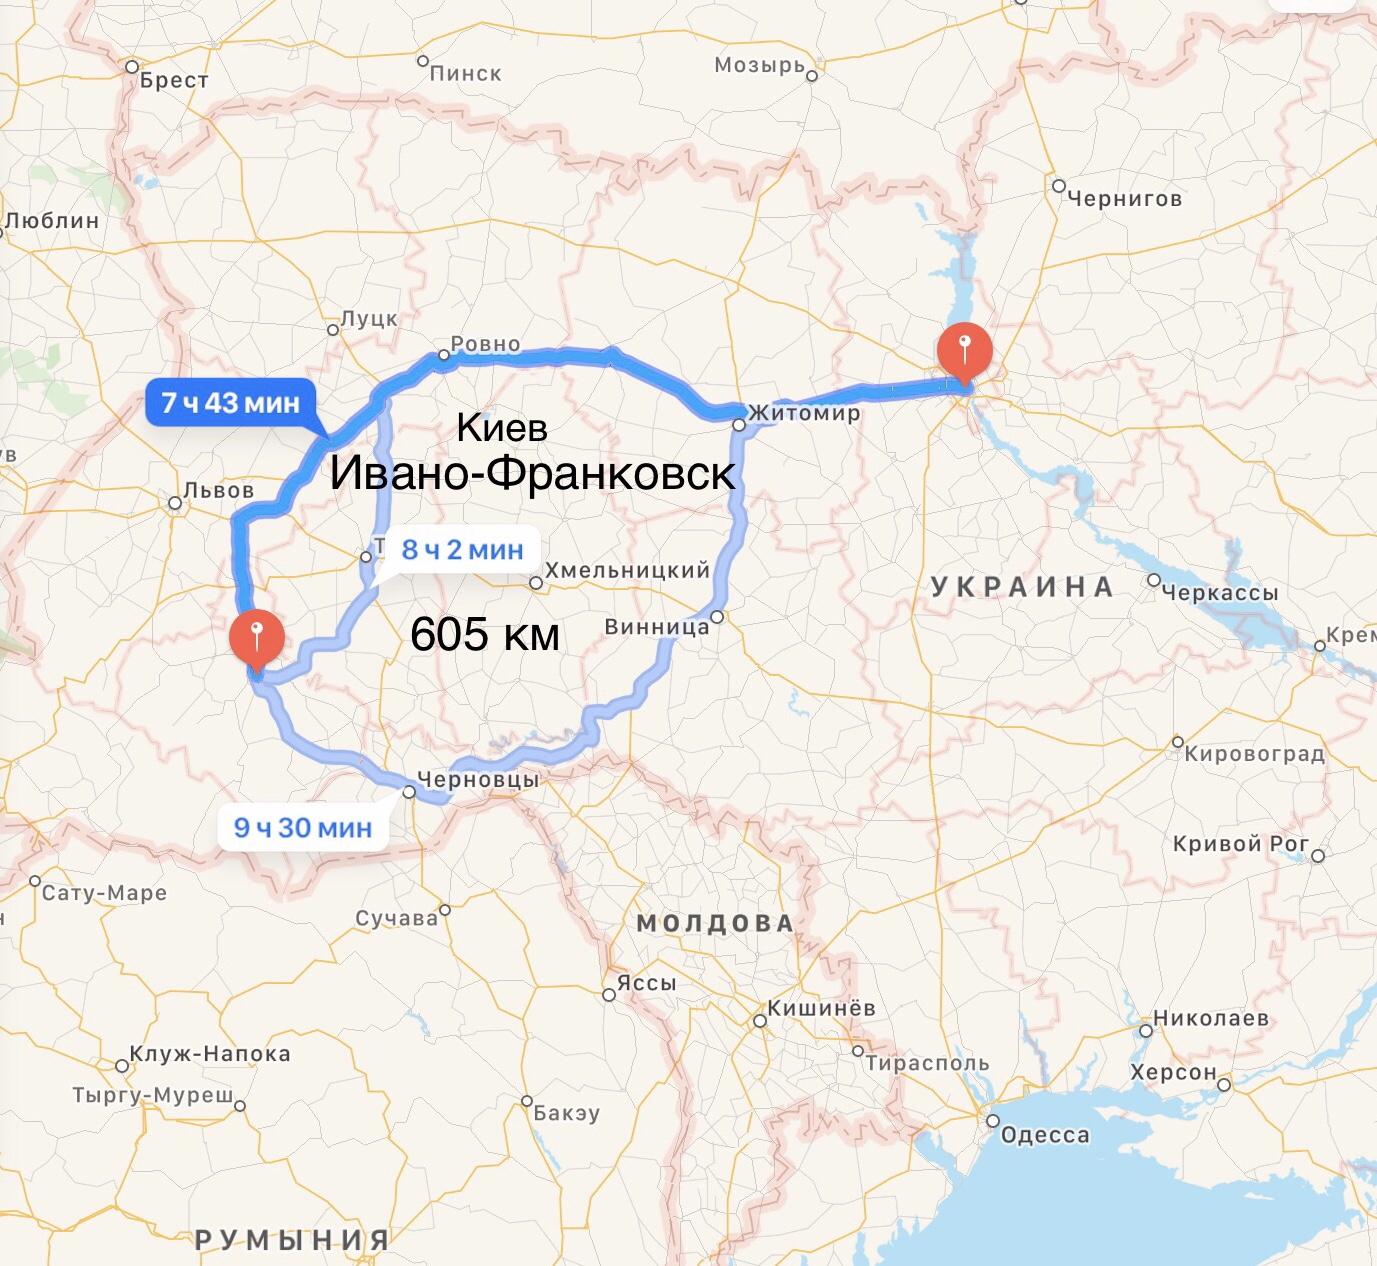 Грузоперевозки Киев – Ивано-Франковск